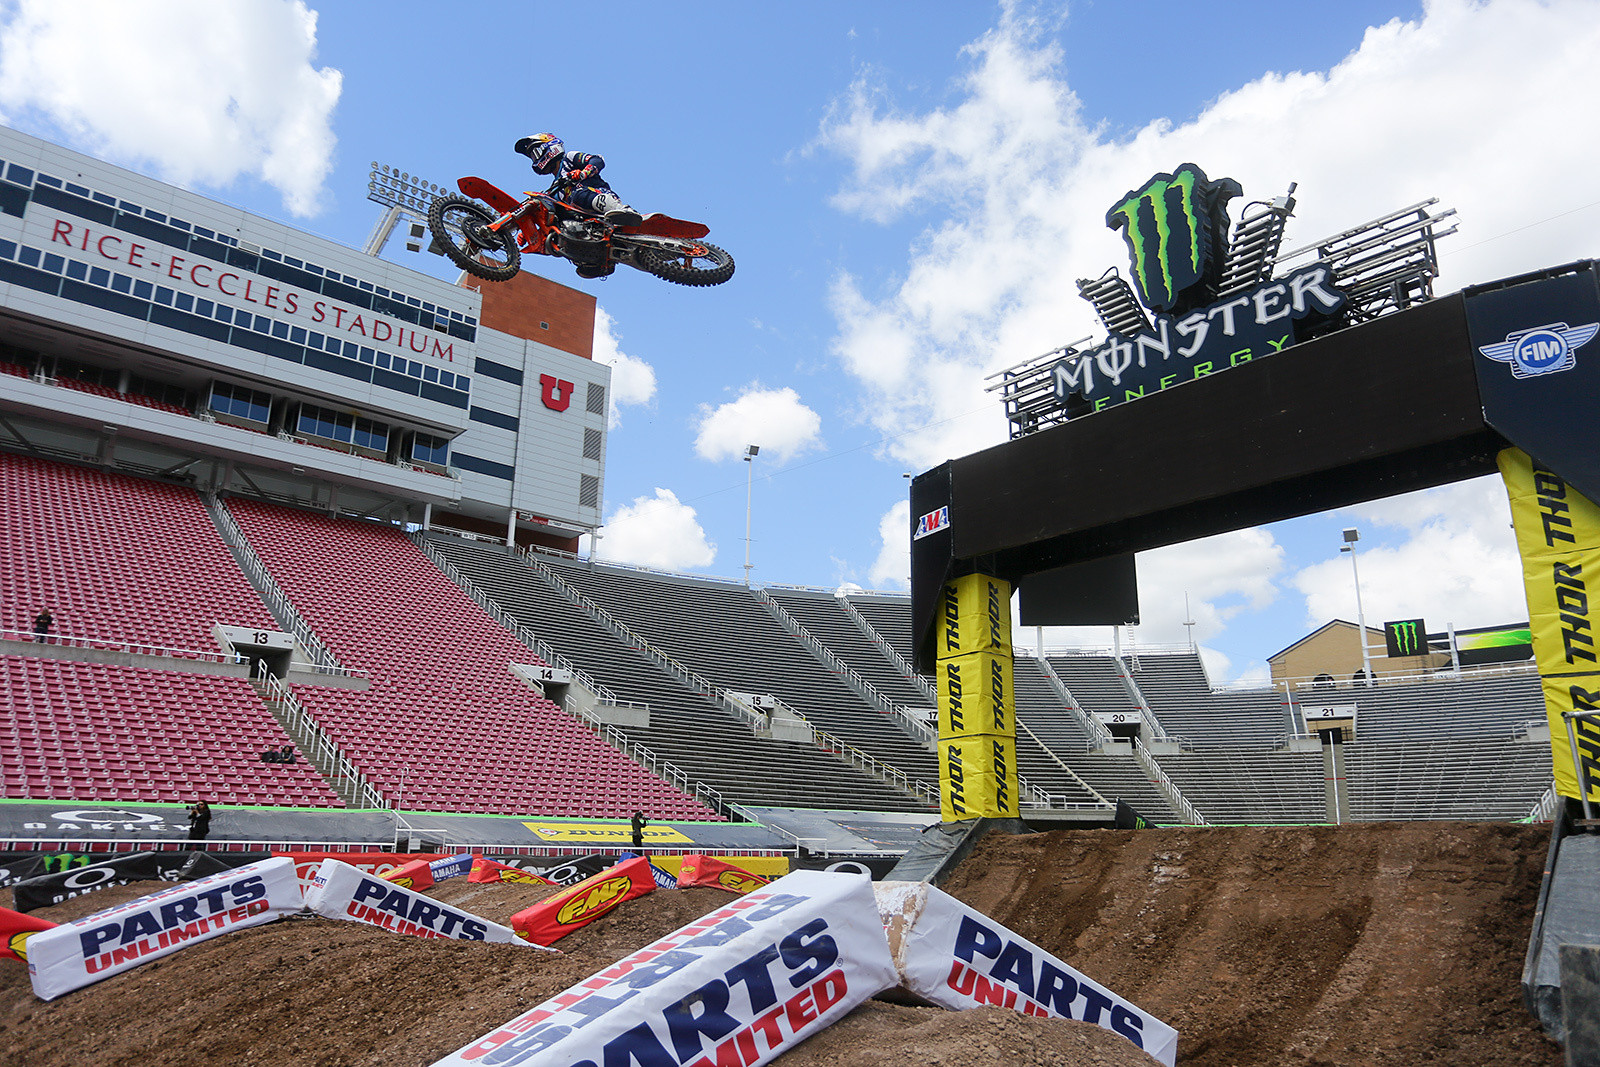 Vital MX Pit Bits: Salt Lake City - Vital MX Pit Bits: Salt Lake City - Motocross Pictures - Vital MX